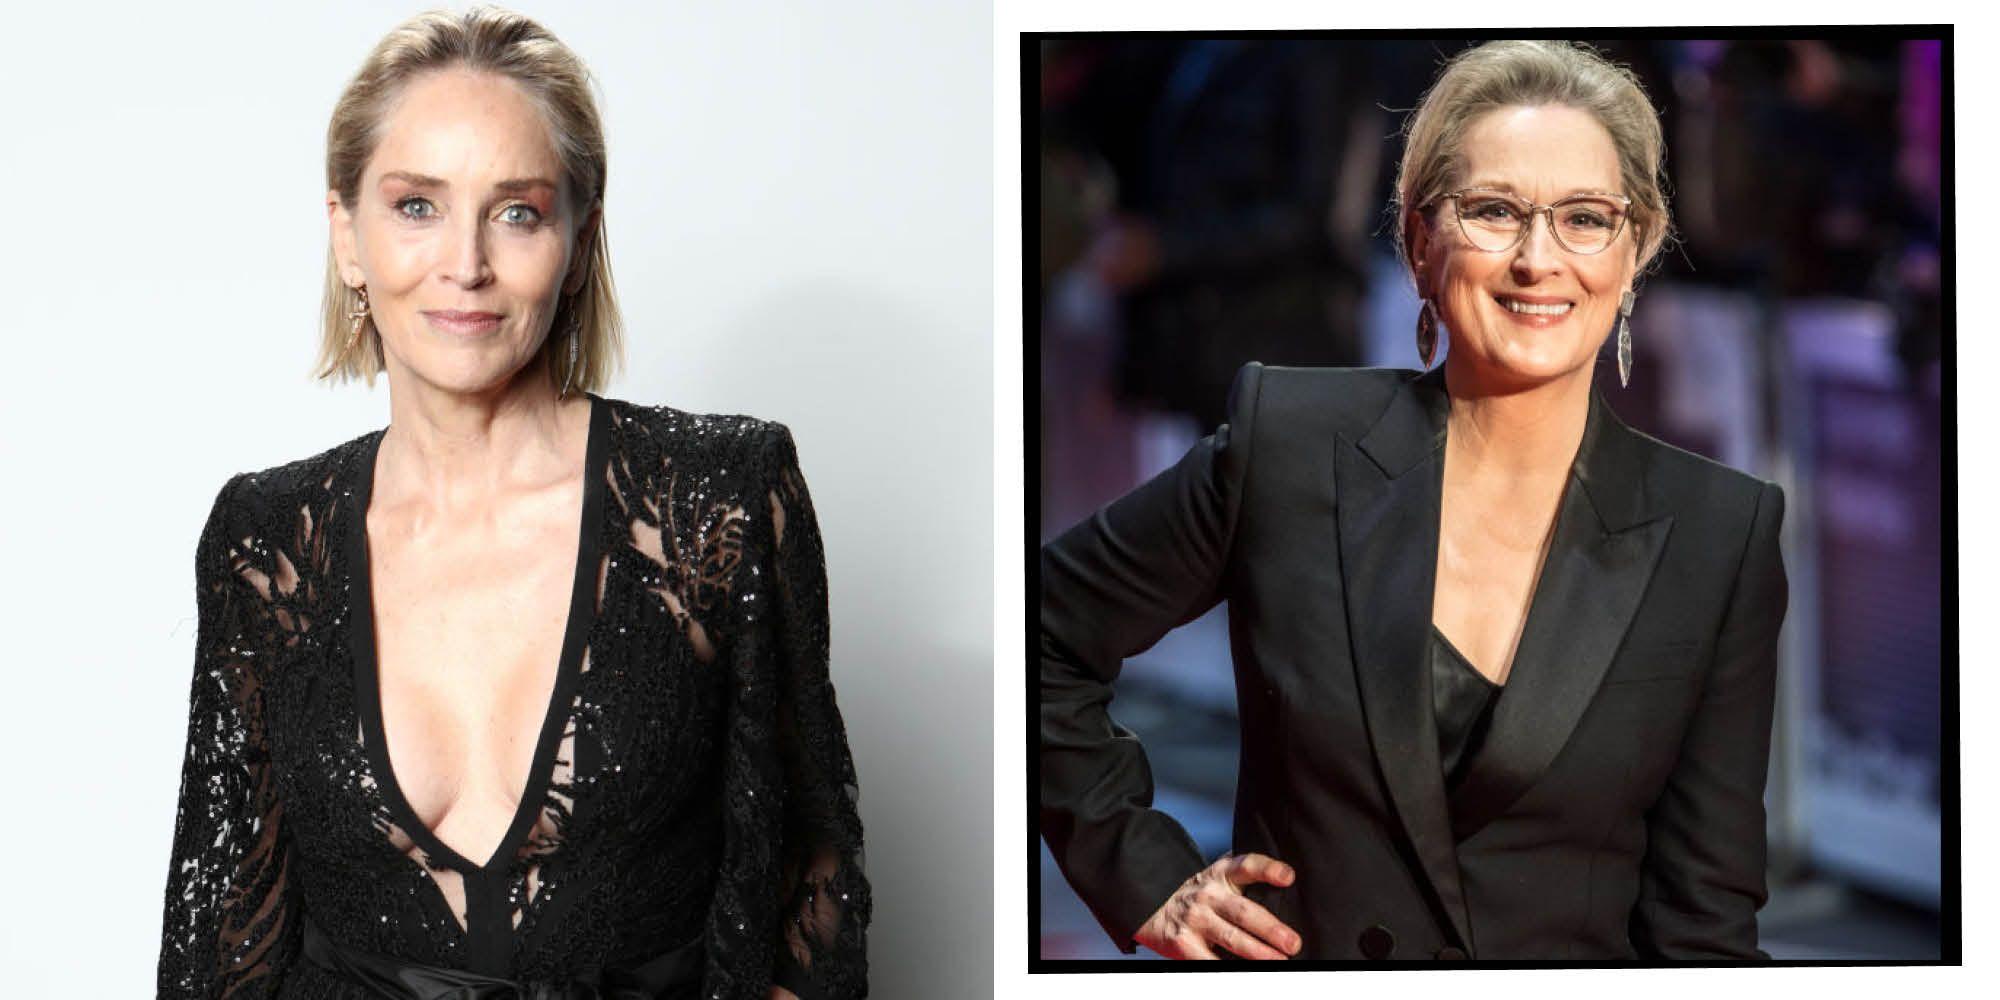 Sharon Stone Criticises Meryl Streep 'Icon' Status In Hollywood